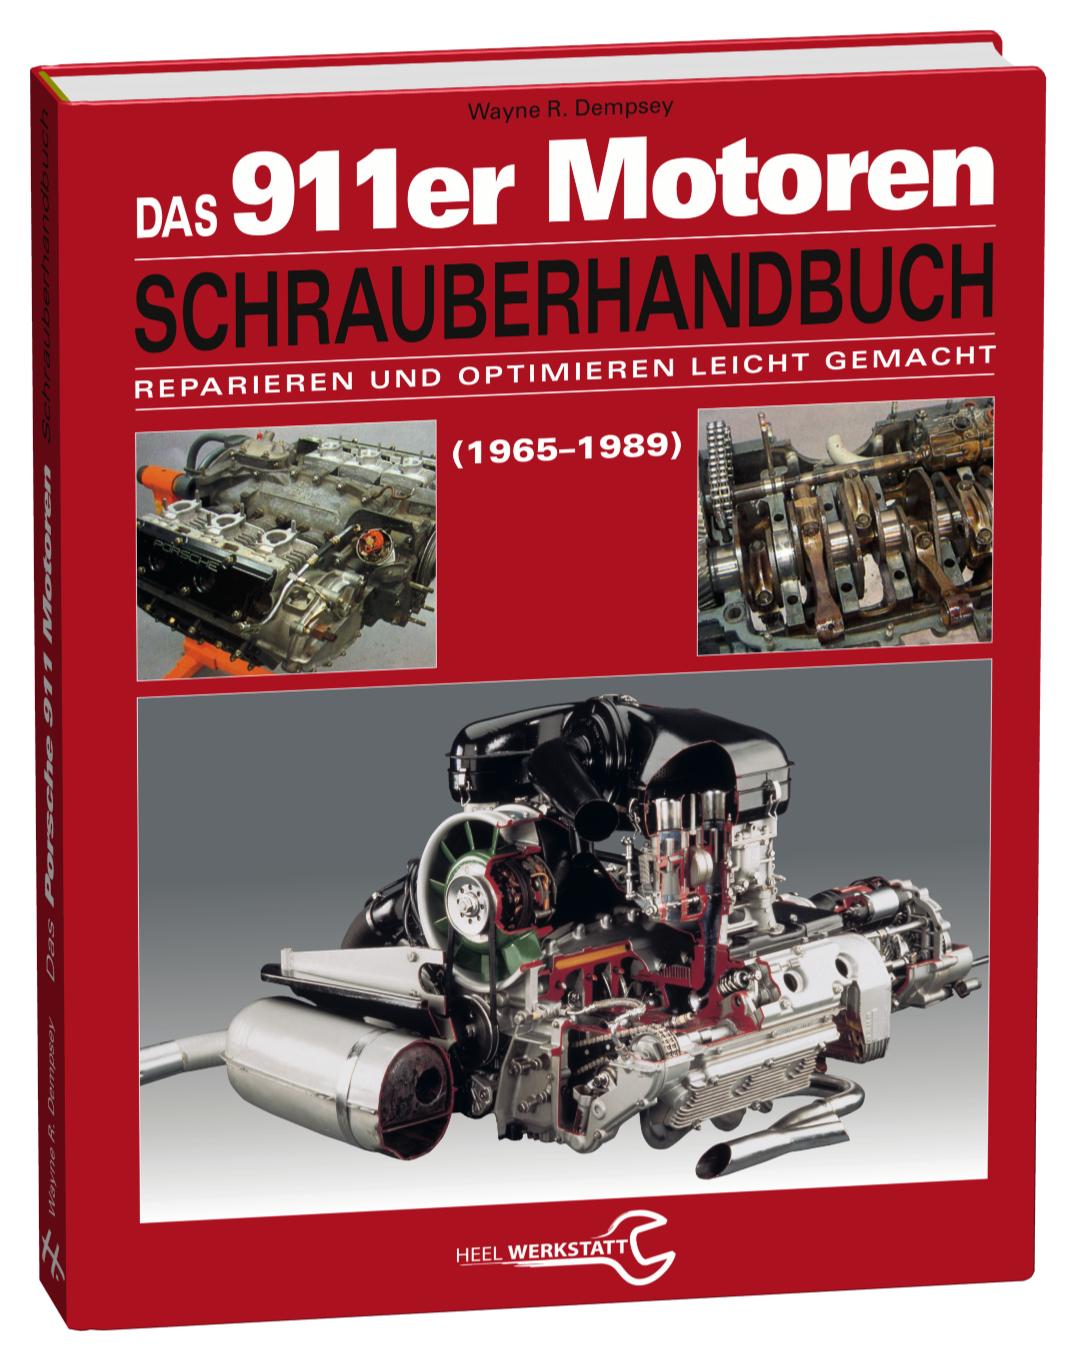 Das 911er Motoren Schrauberhandbuch